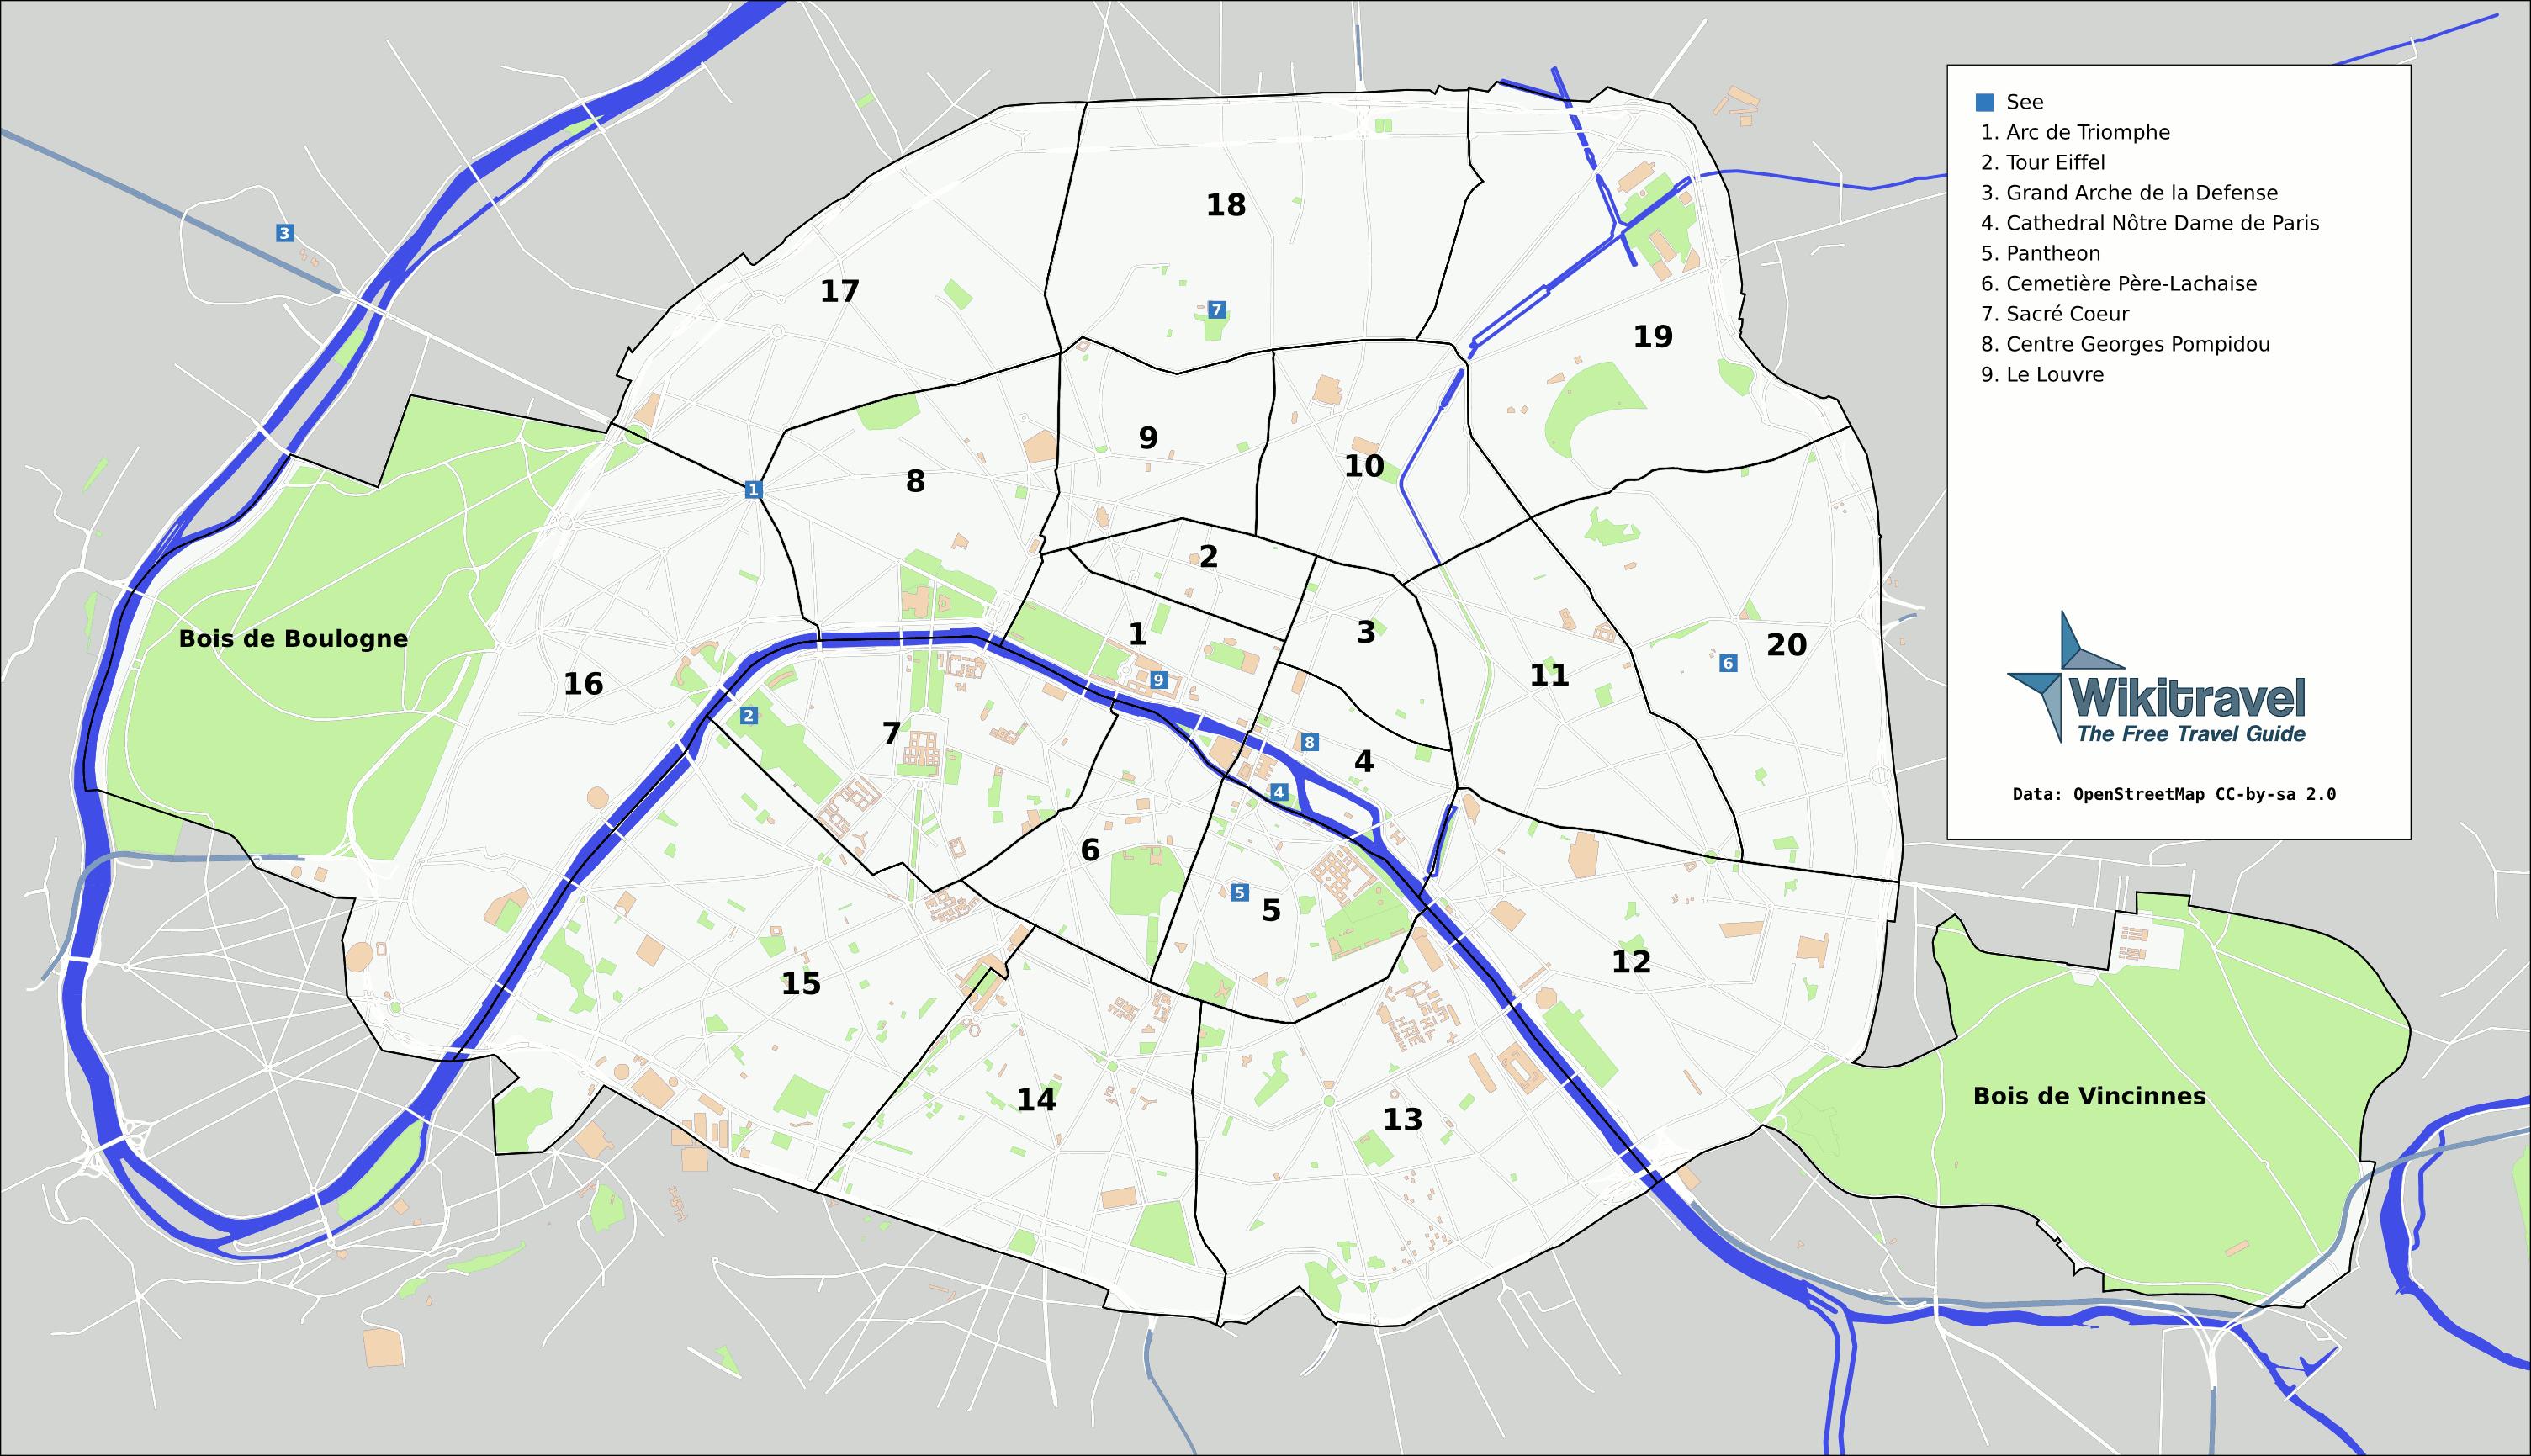 map of Paris districts | Paris | Pinterest | Madrid, Tourist map and ...